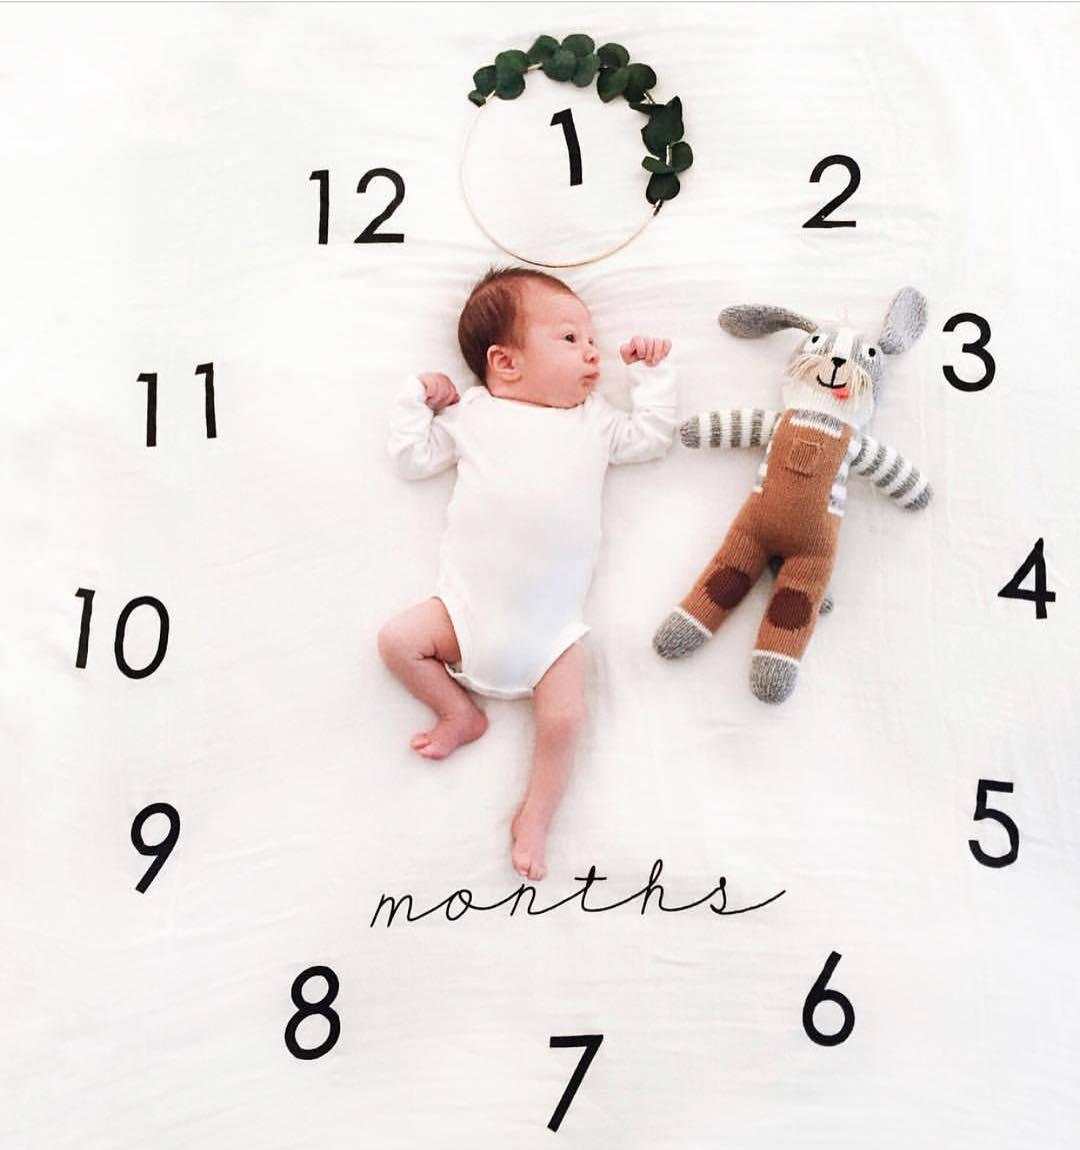 newborn-baby-milestone-blankets-monthly-photography-blanket-infant-baby-milestone-blanket-photo-photography